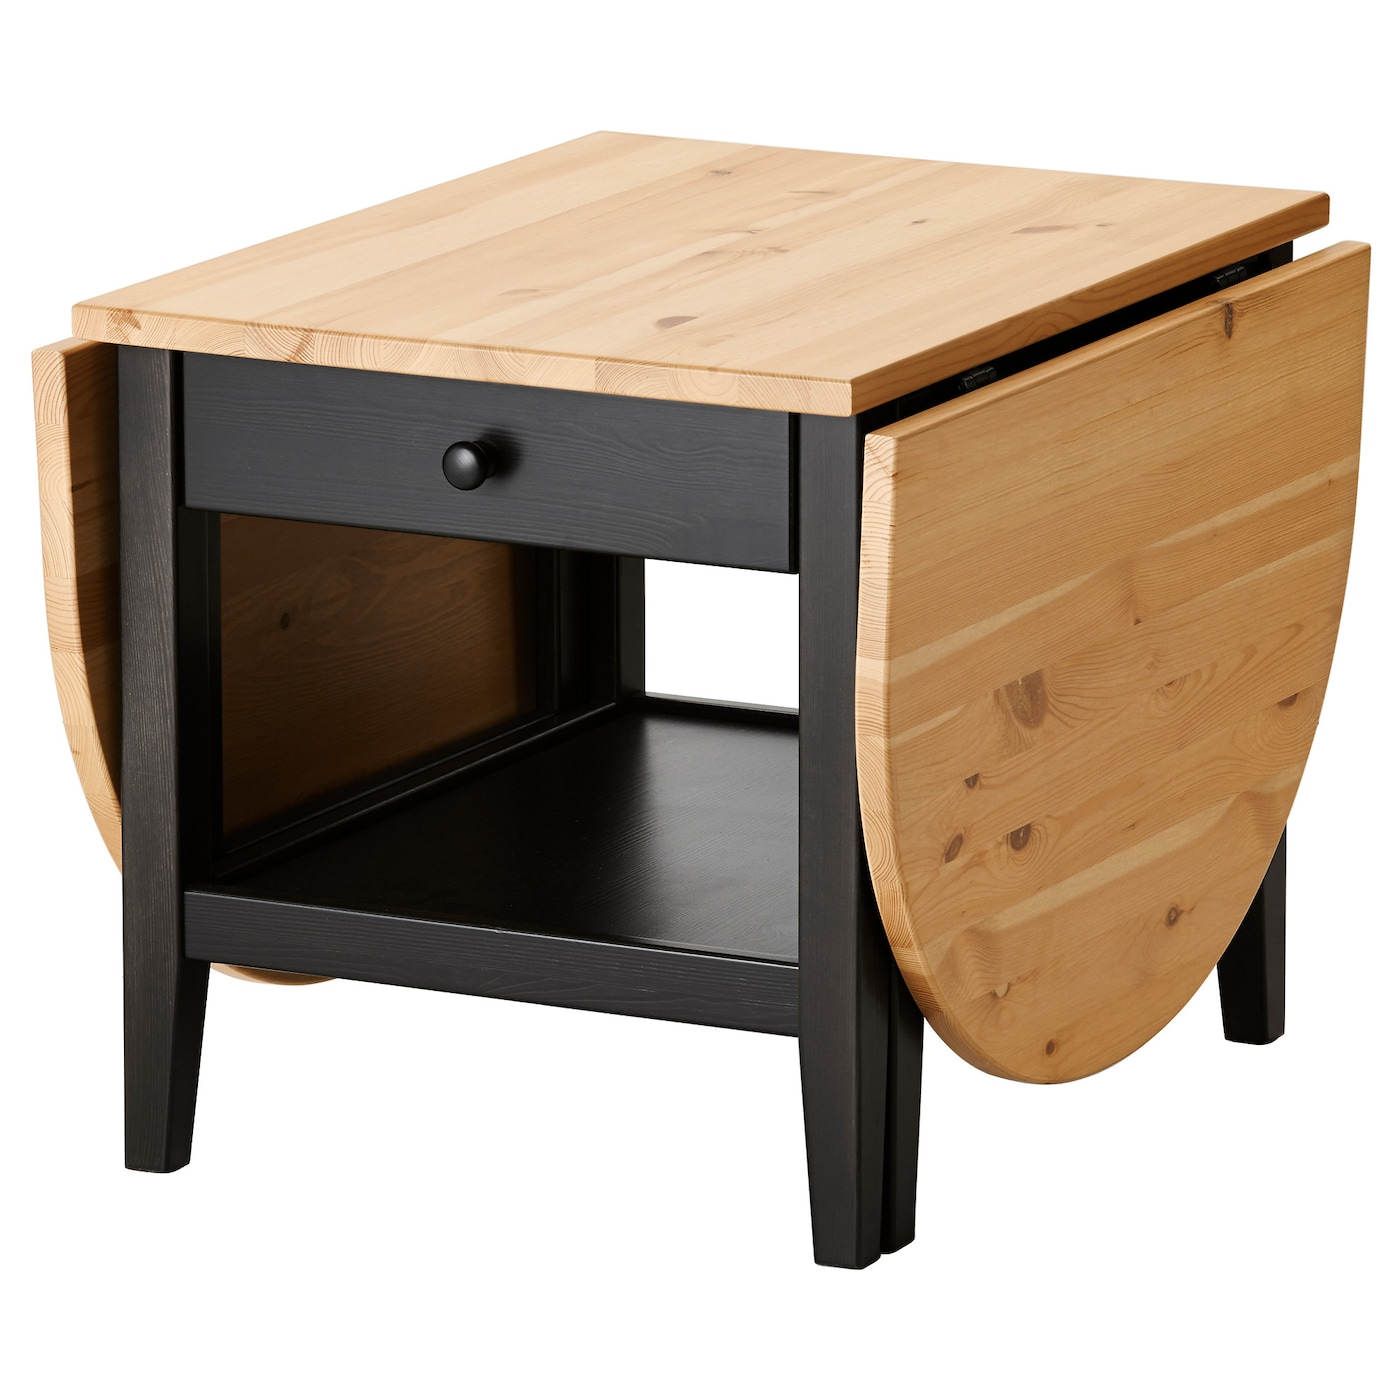 arkelstorp table basse noir 65 x 140 x 52 cm ikea. Black Bedroom Furniture Sets. Home Design Ideas